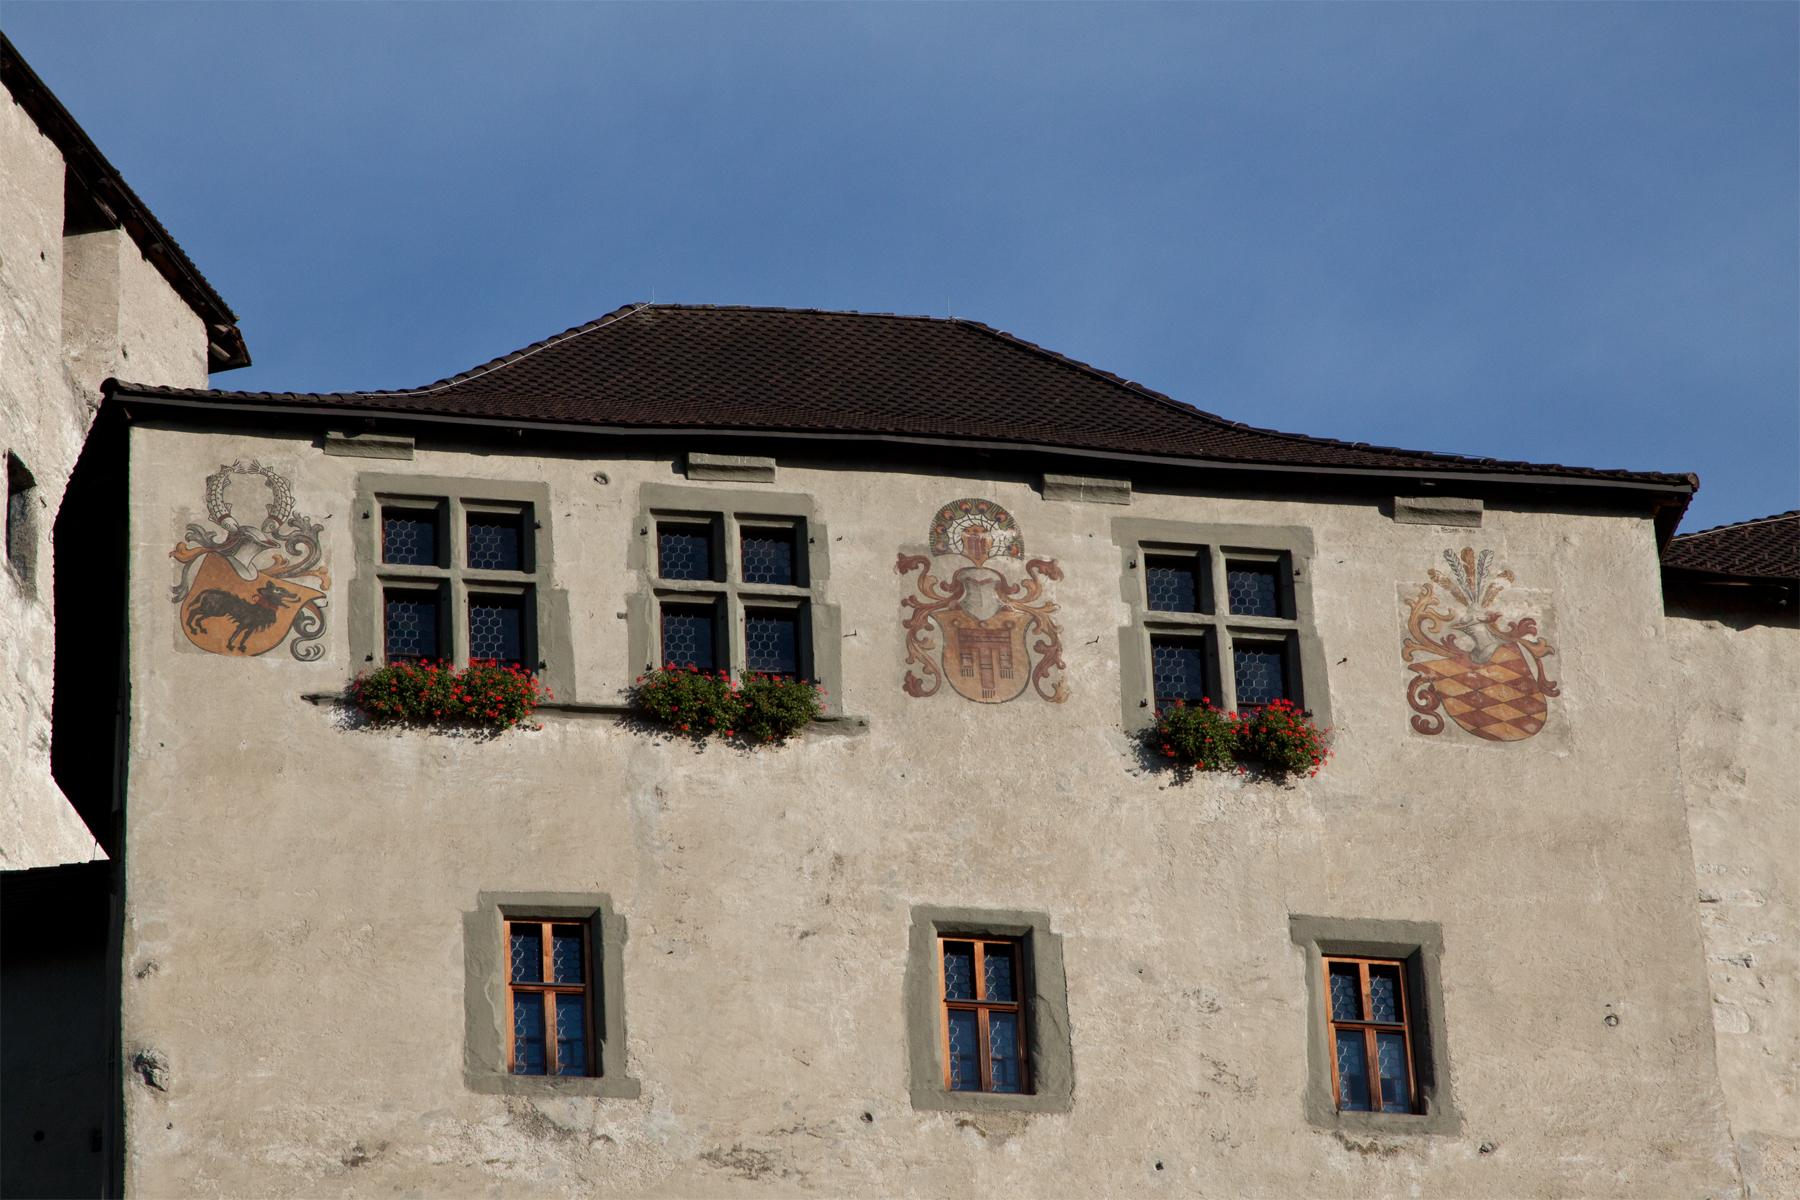 Wappen an der Schattenburg